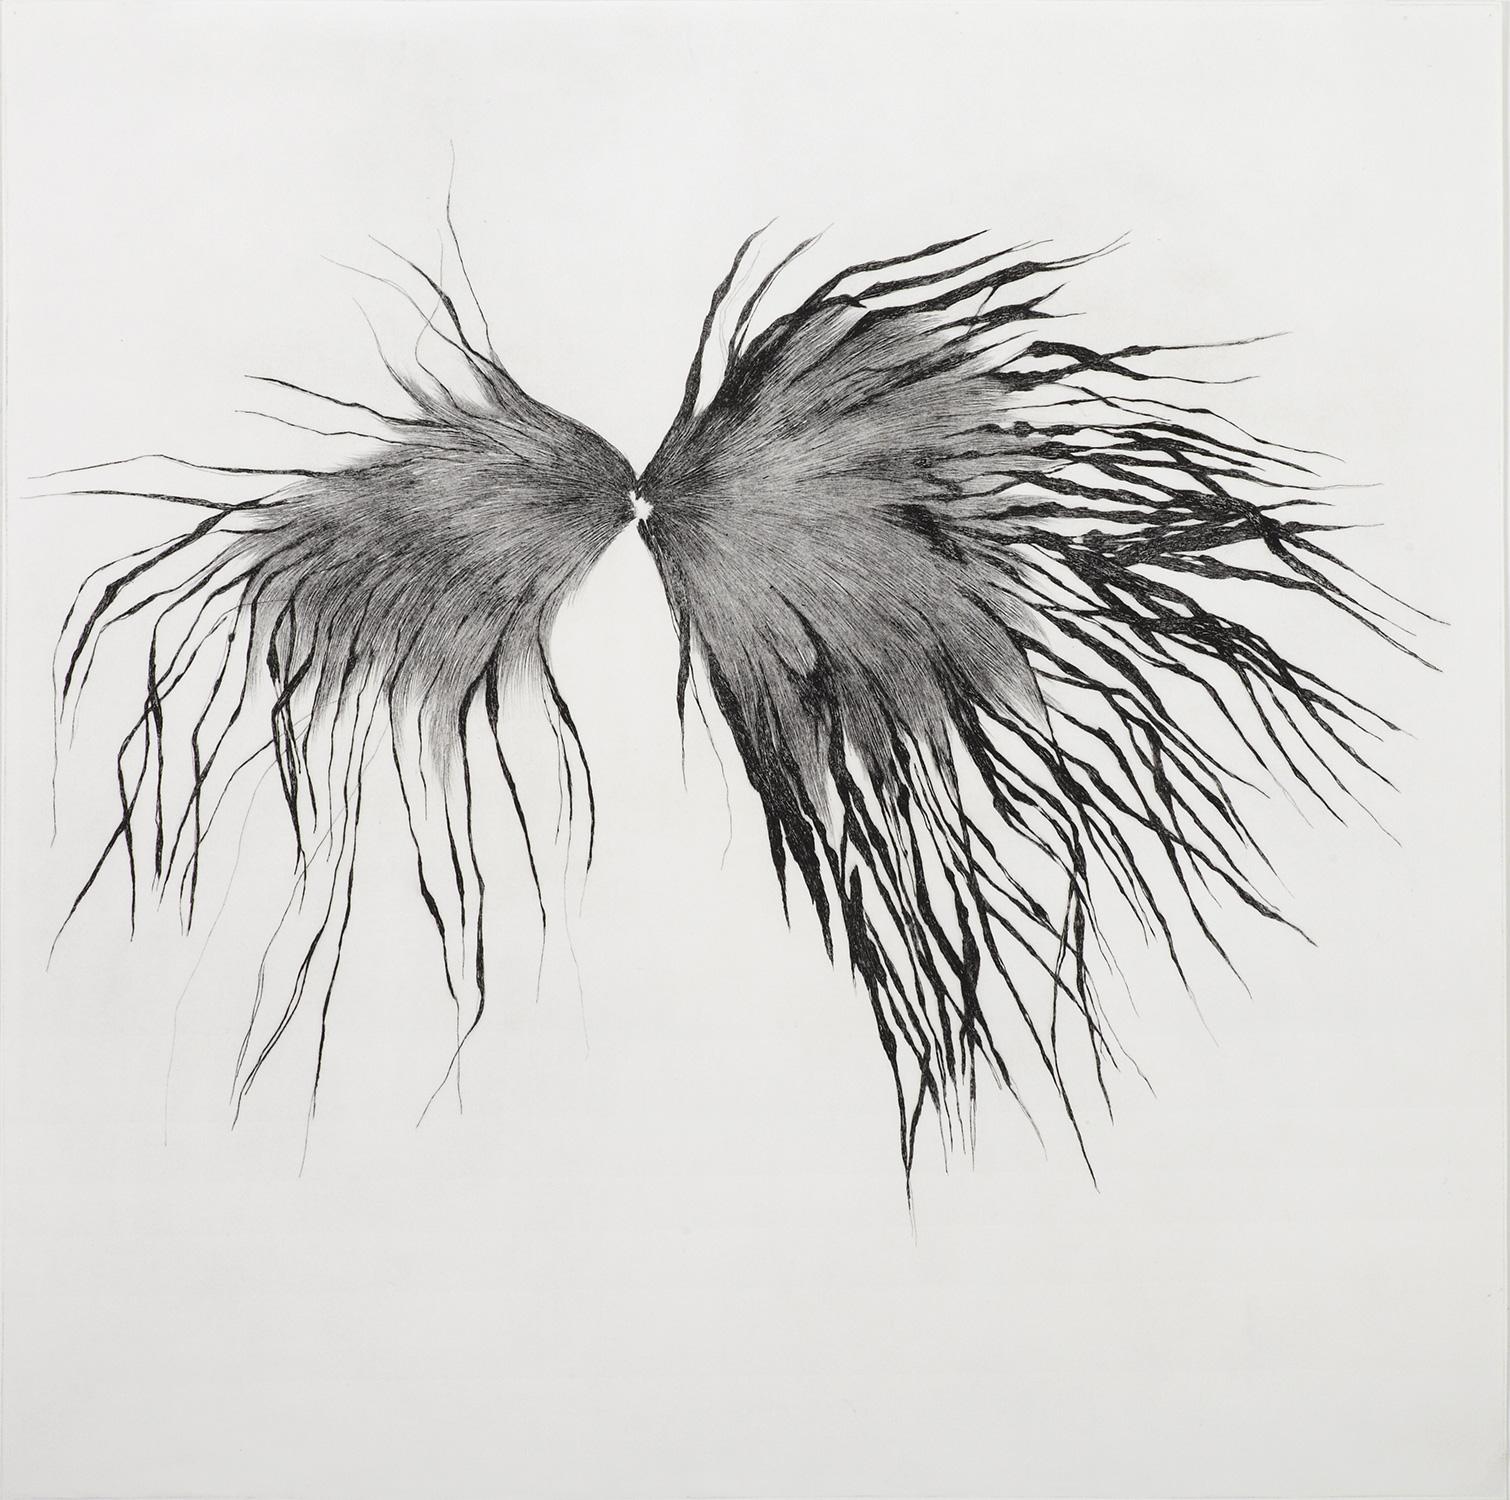 <i>oeil</i>, 2009, pointe sèche, 80x80cm